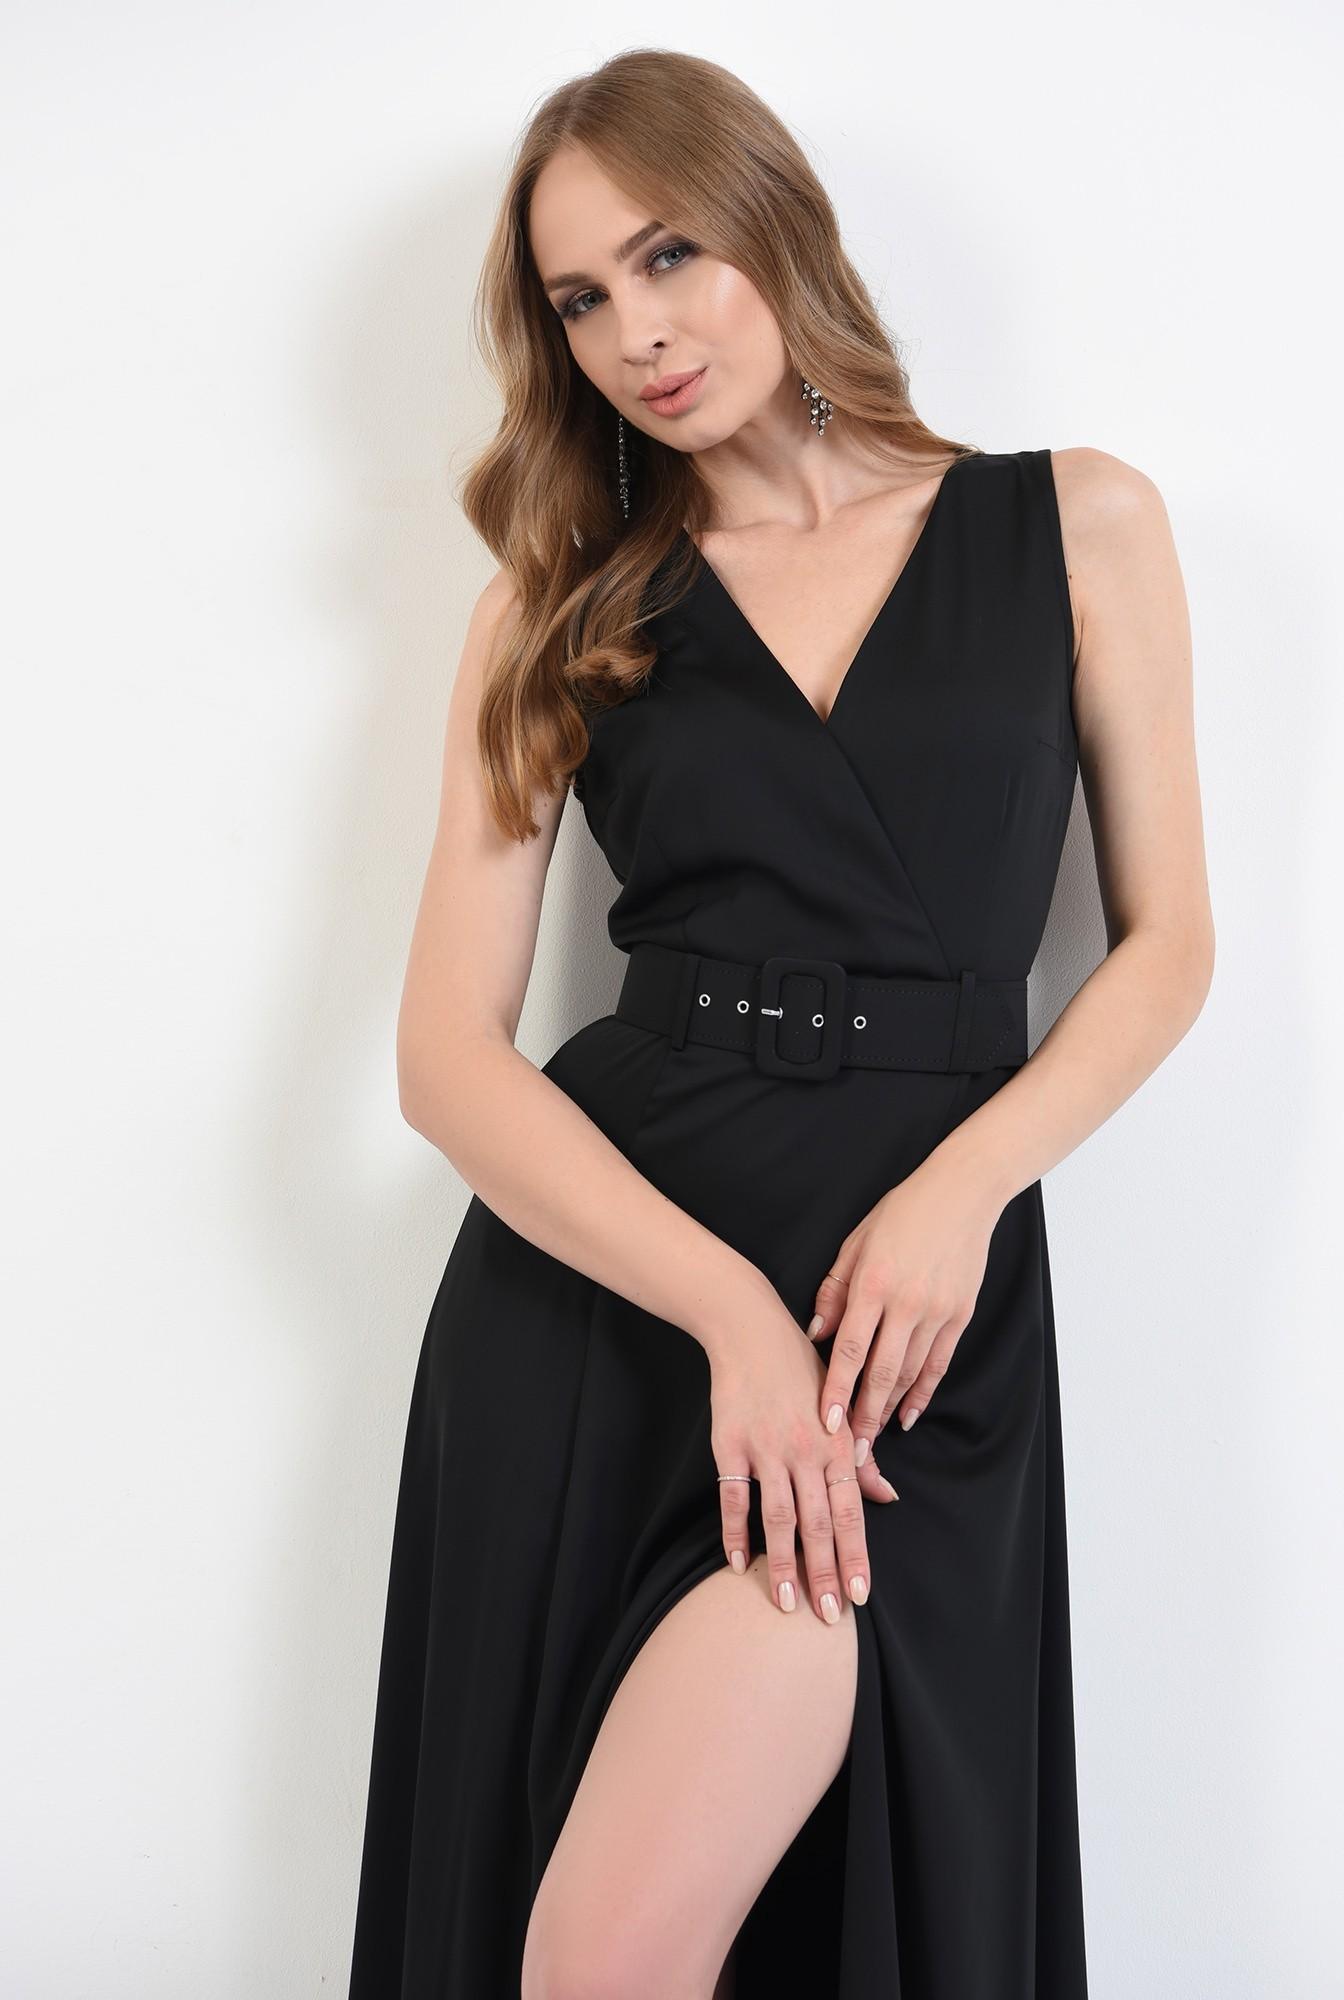 0 - 360 - rochie lunga, neagra, cu centura, Poema